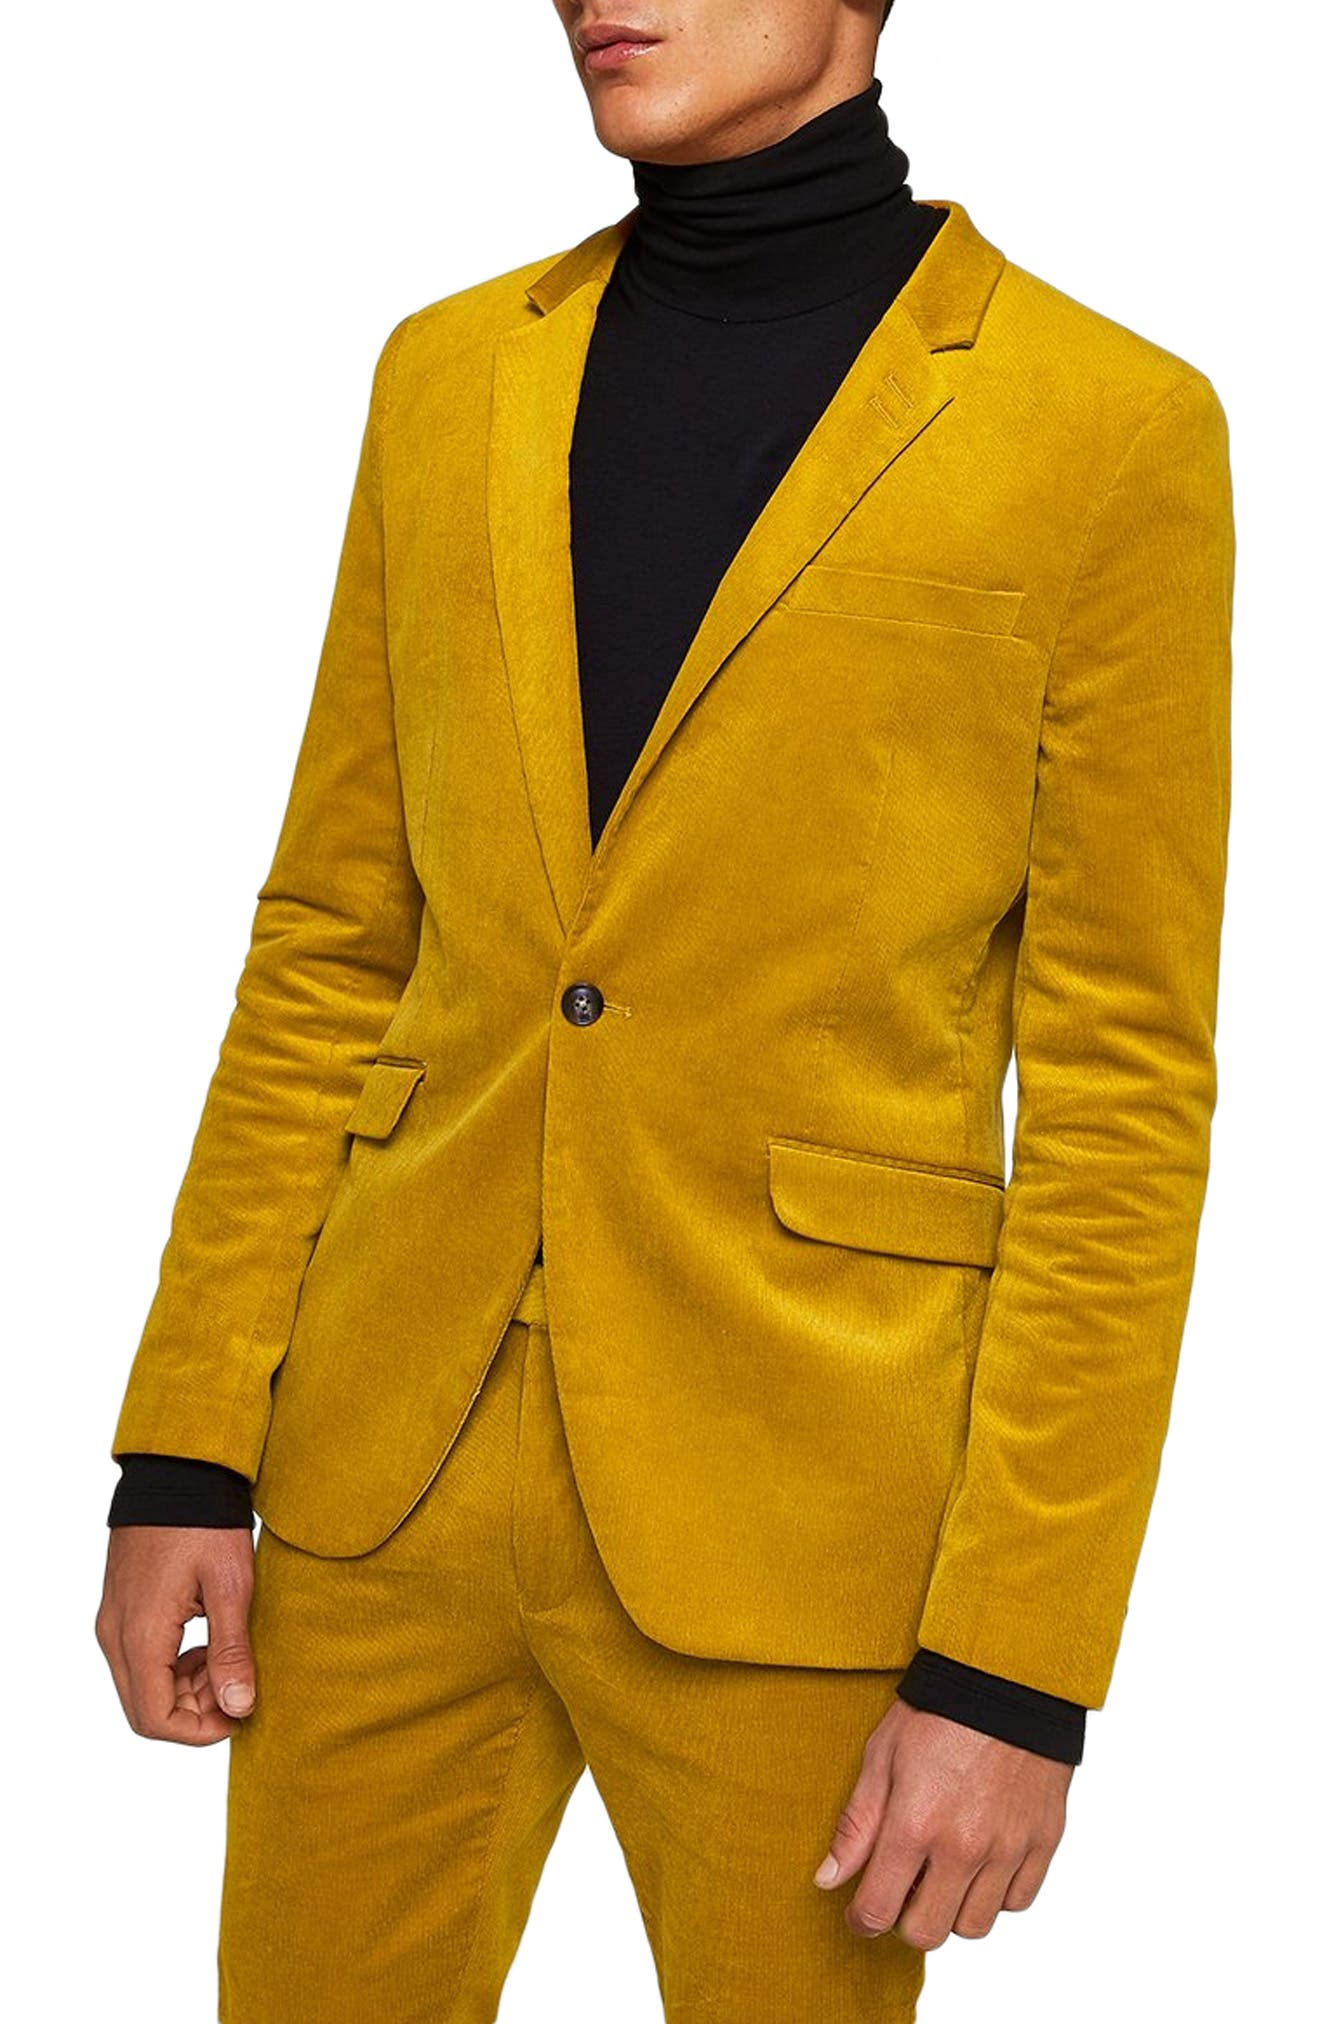 TOPMAN Corduroy Super Skinny Suit Jacket, Main, color, 700